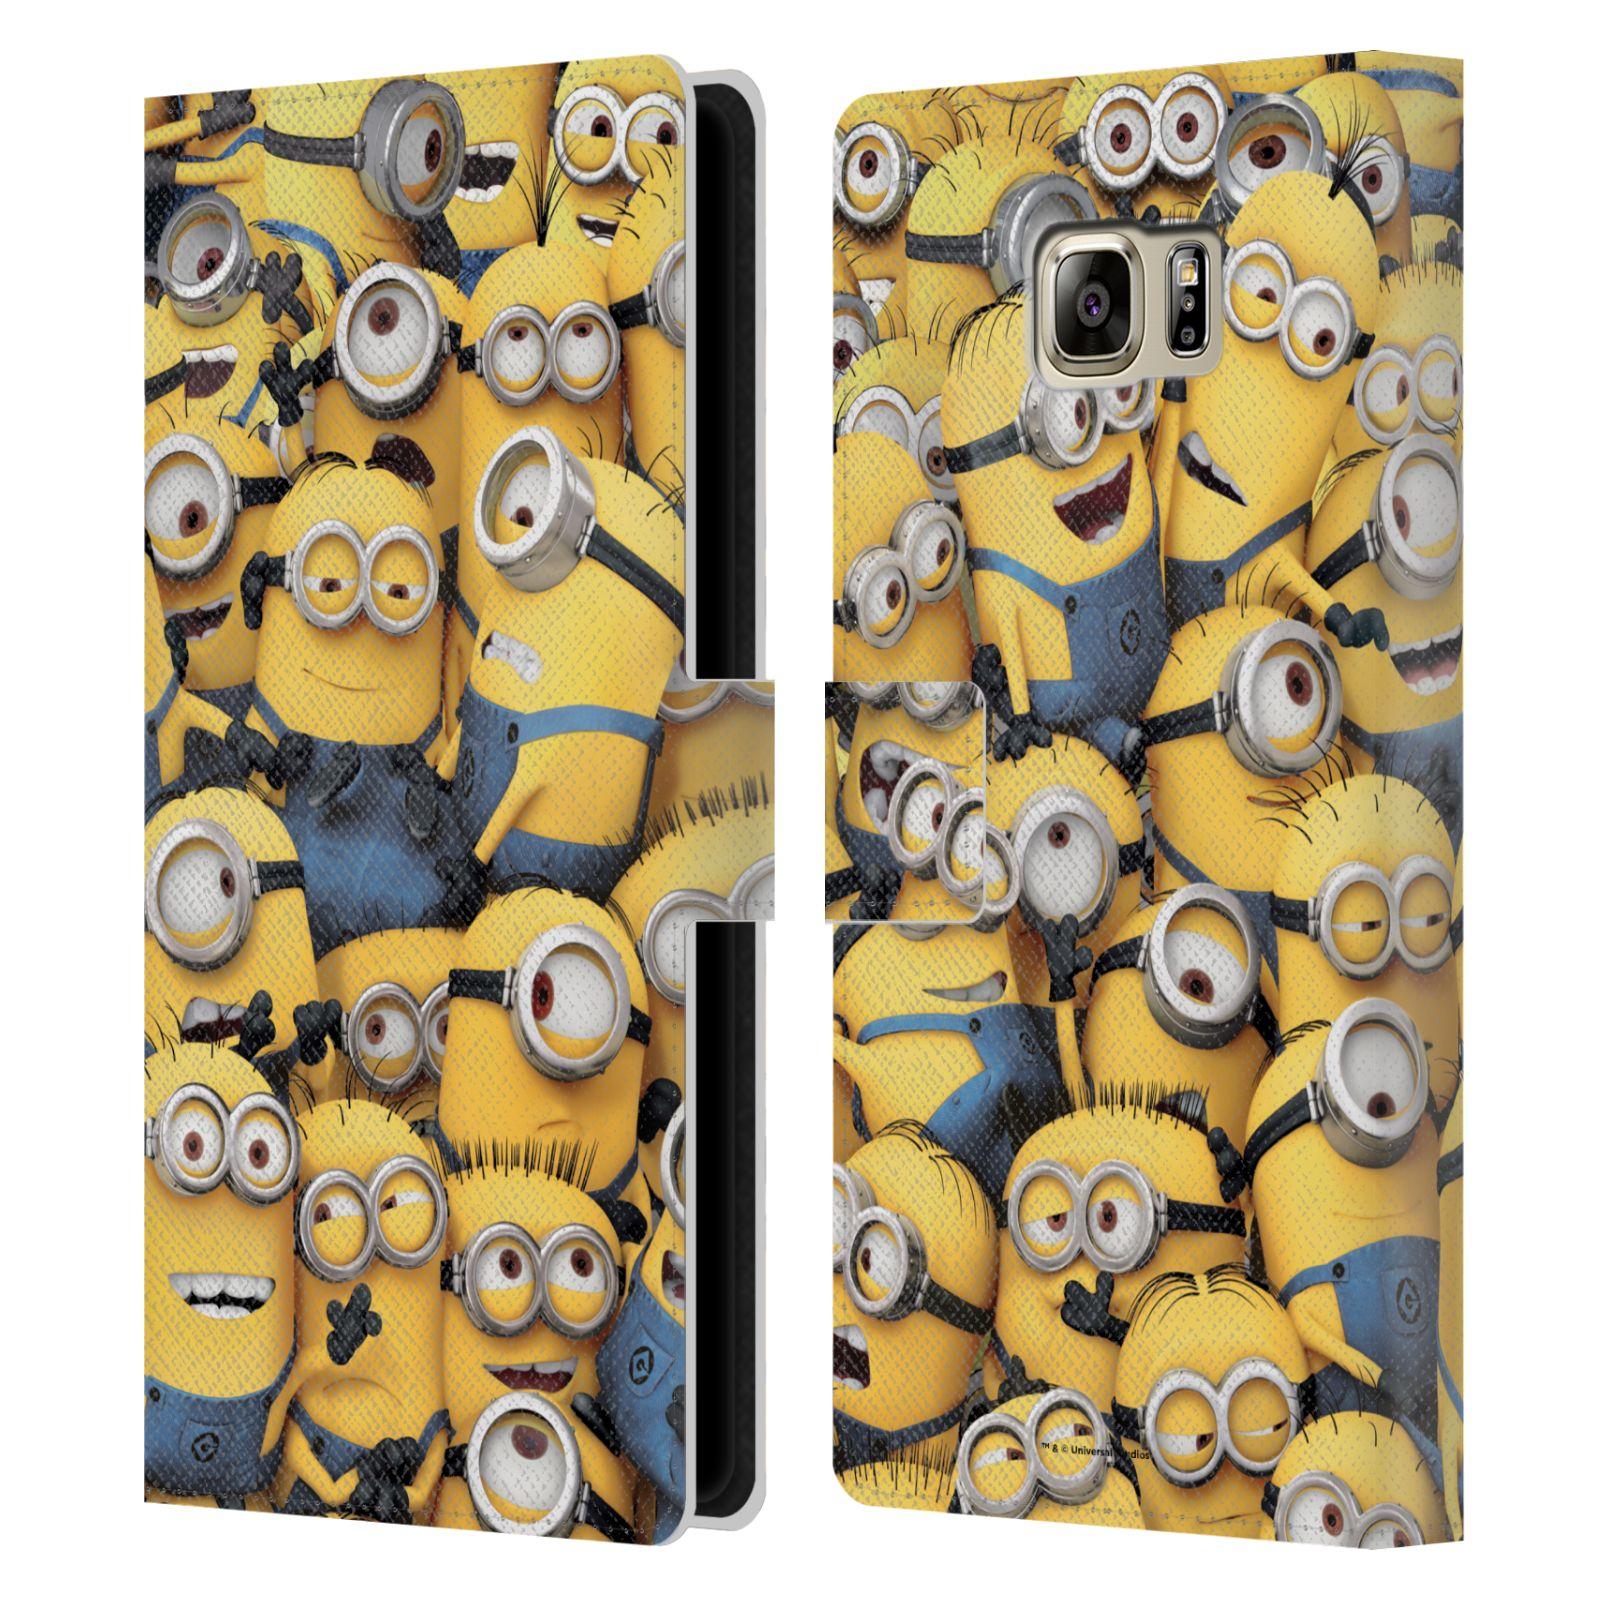 Pouzdro na mobil Samsung Galaxy NOTE 5 - Head Case - Mimoni - hromada mimoňů